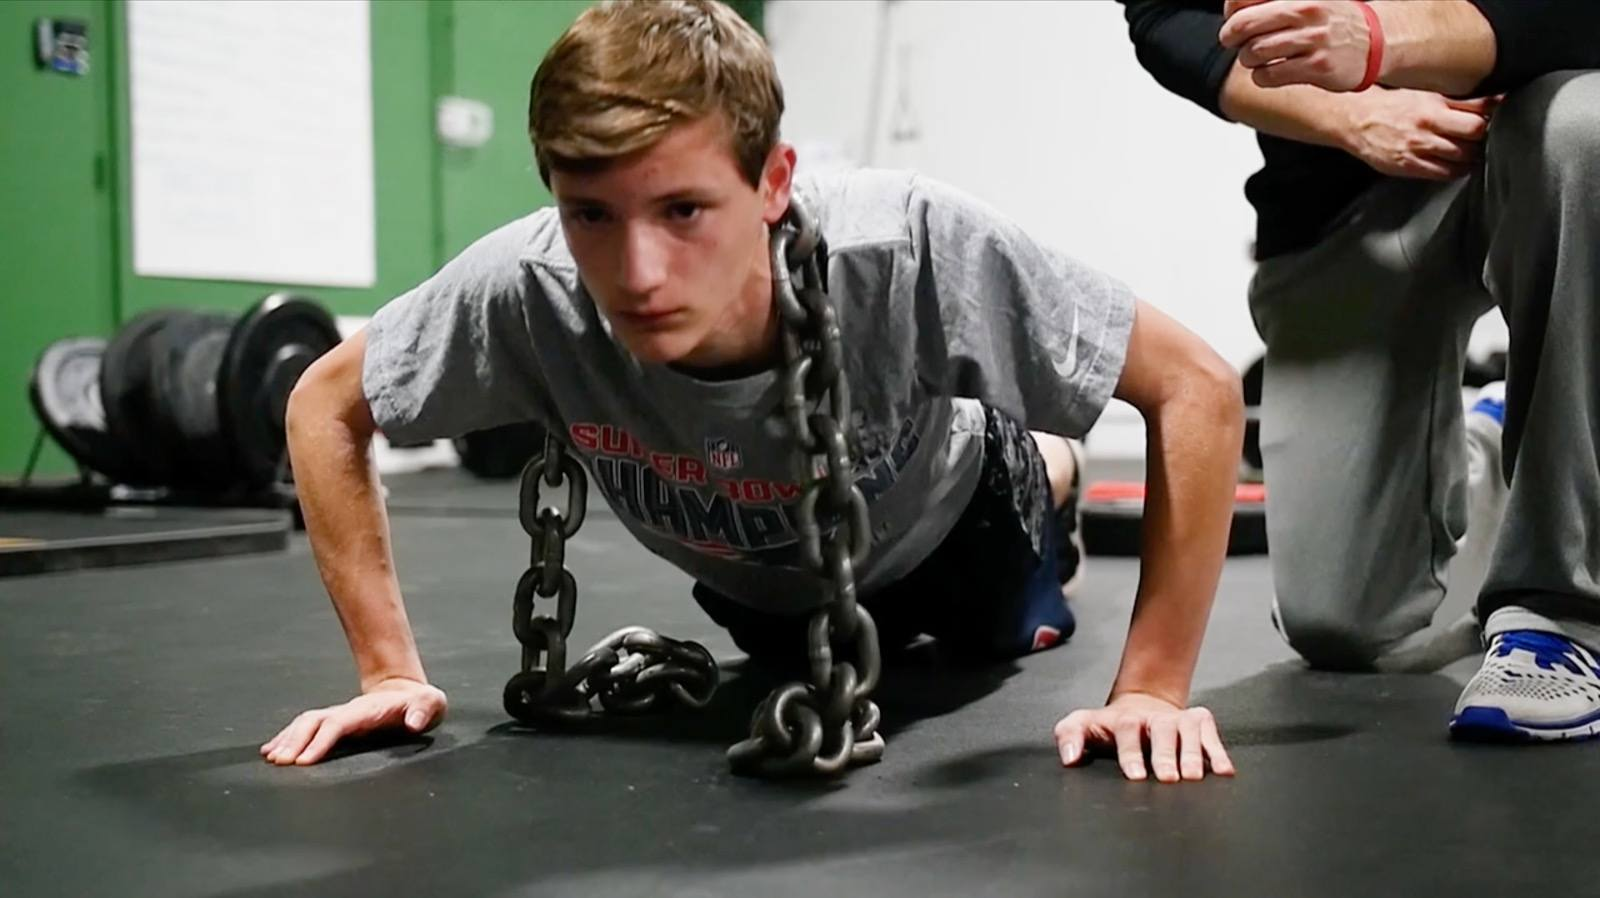 Waltham Sports Performance Training